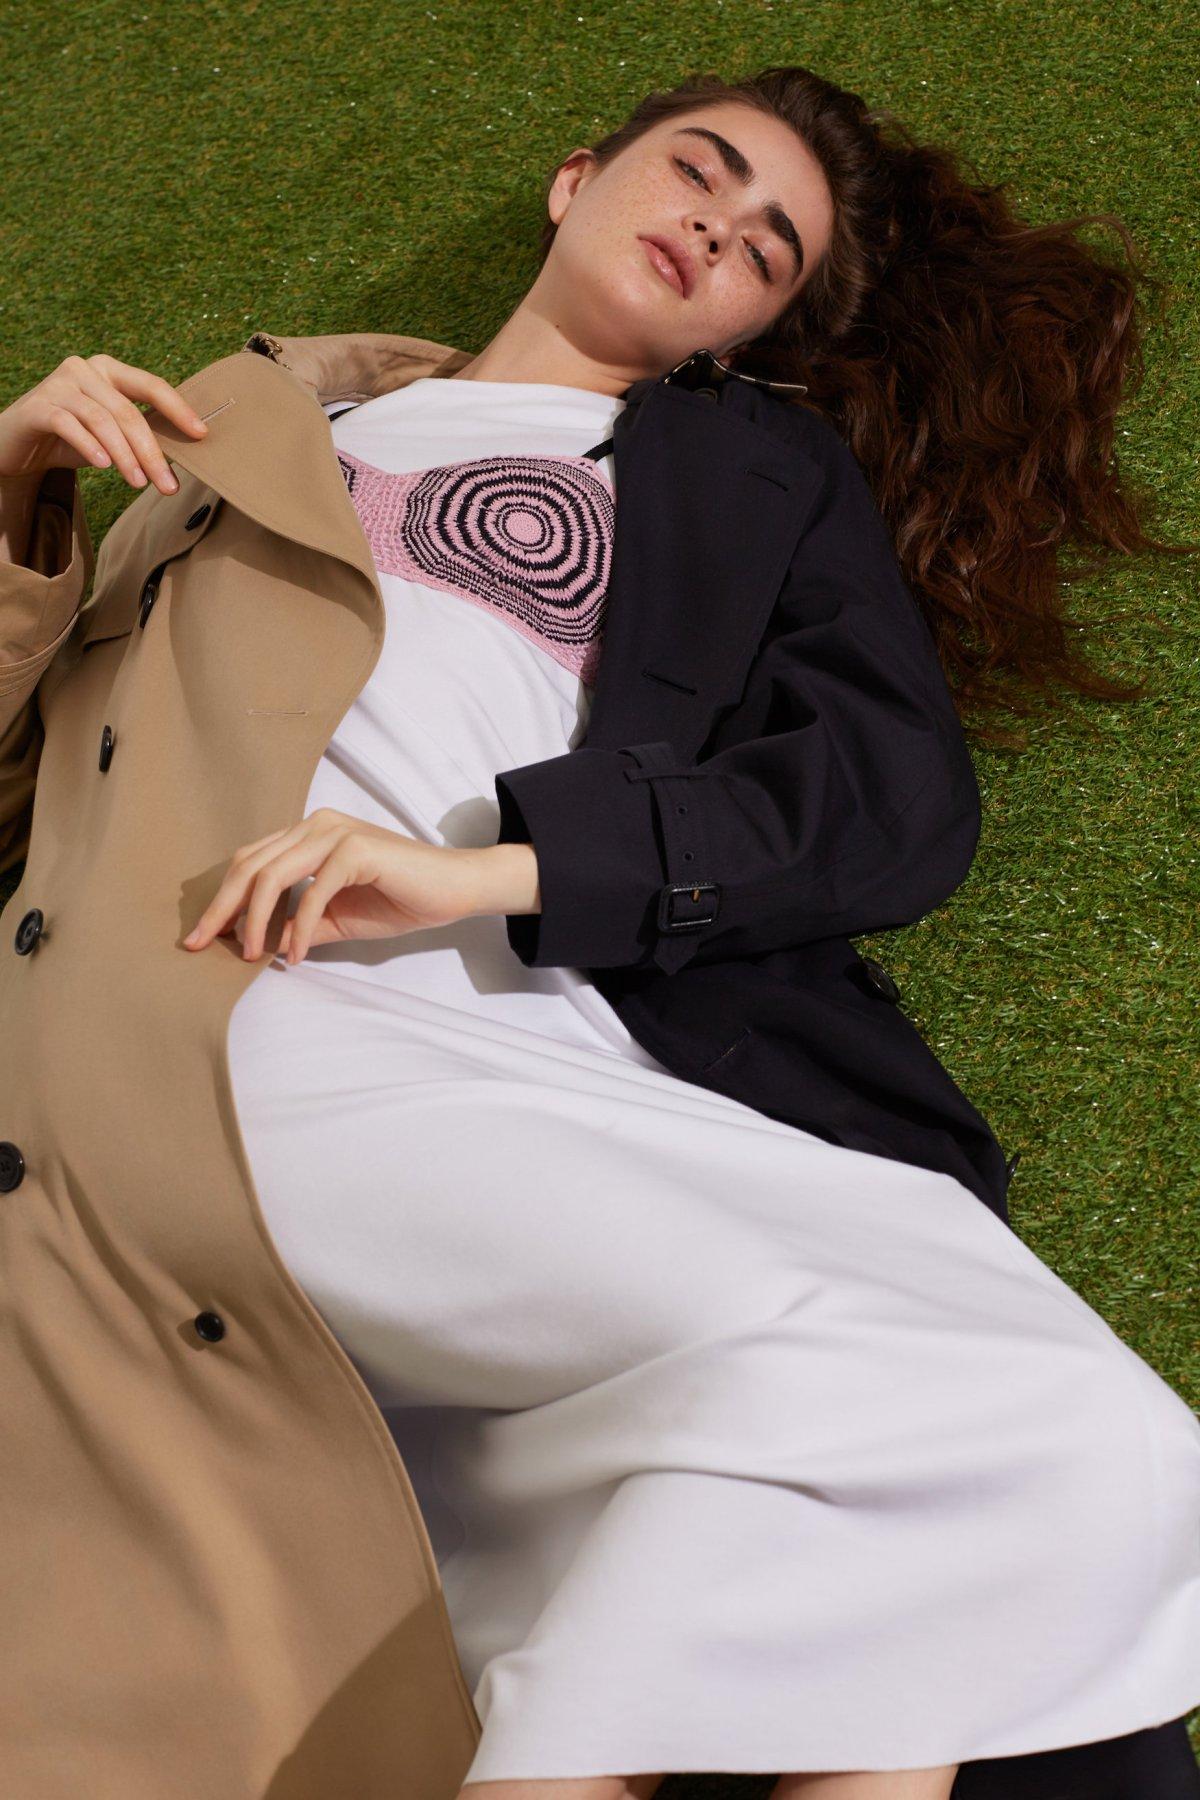 Alisha Nesvat by Arseny Jabiev for Vogue Russia